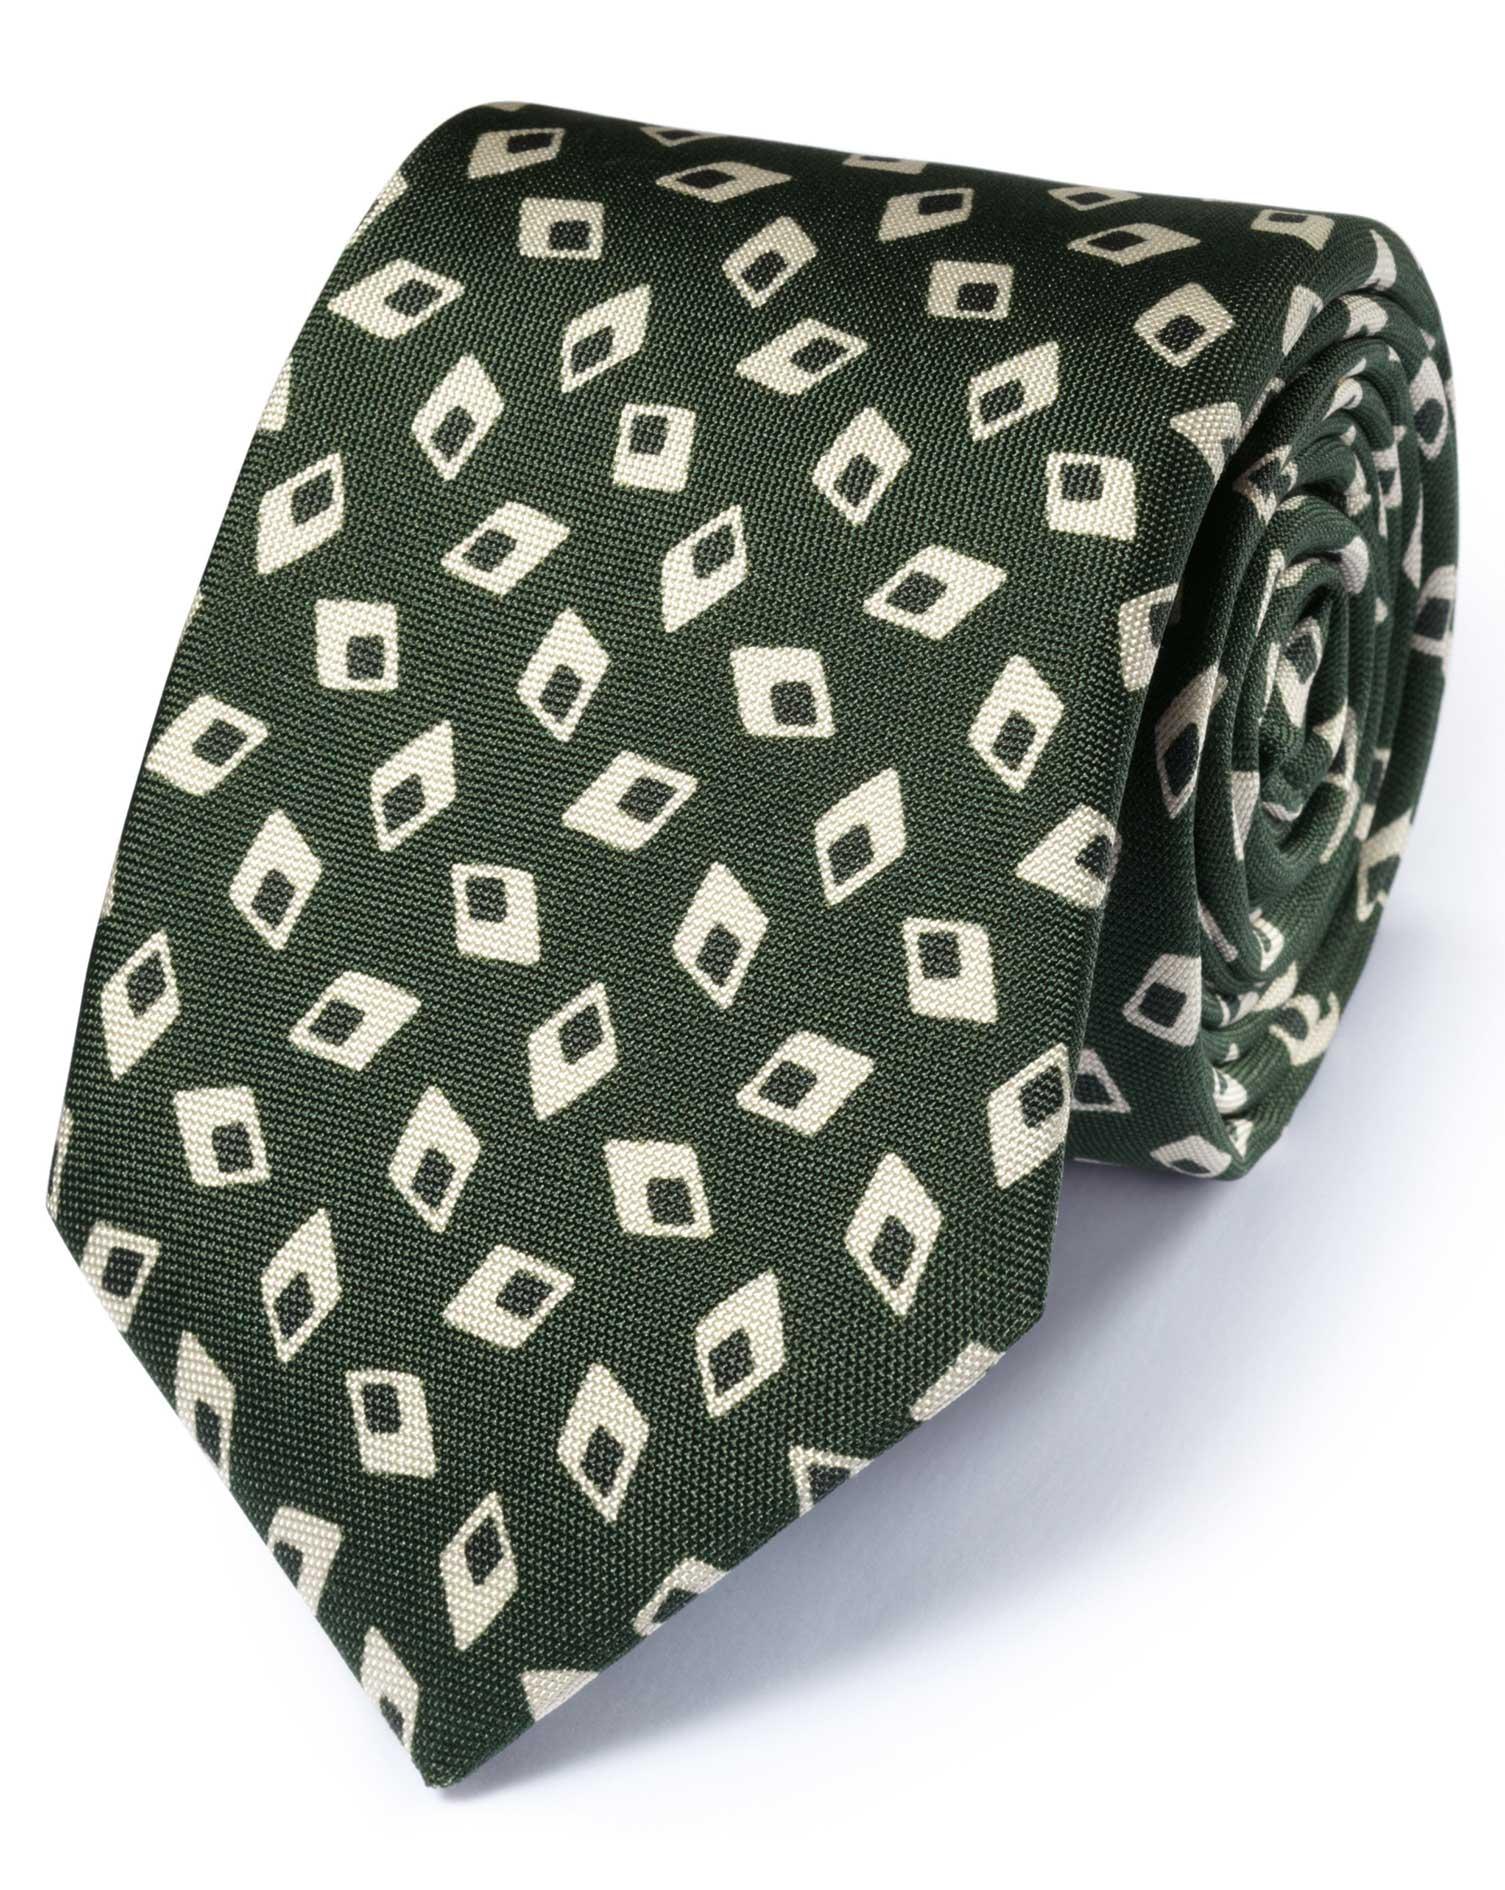 cravate de luxe vert for t en soie italienne losanges charles tyrwhitt. Black Bedroom Furniture Sets. Home Design Ideas